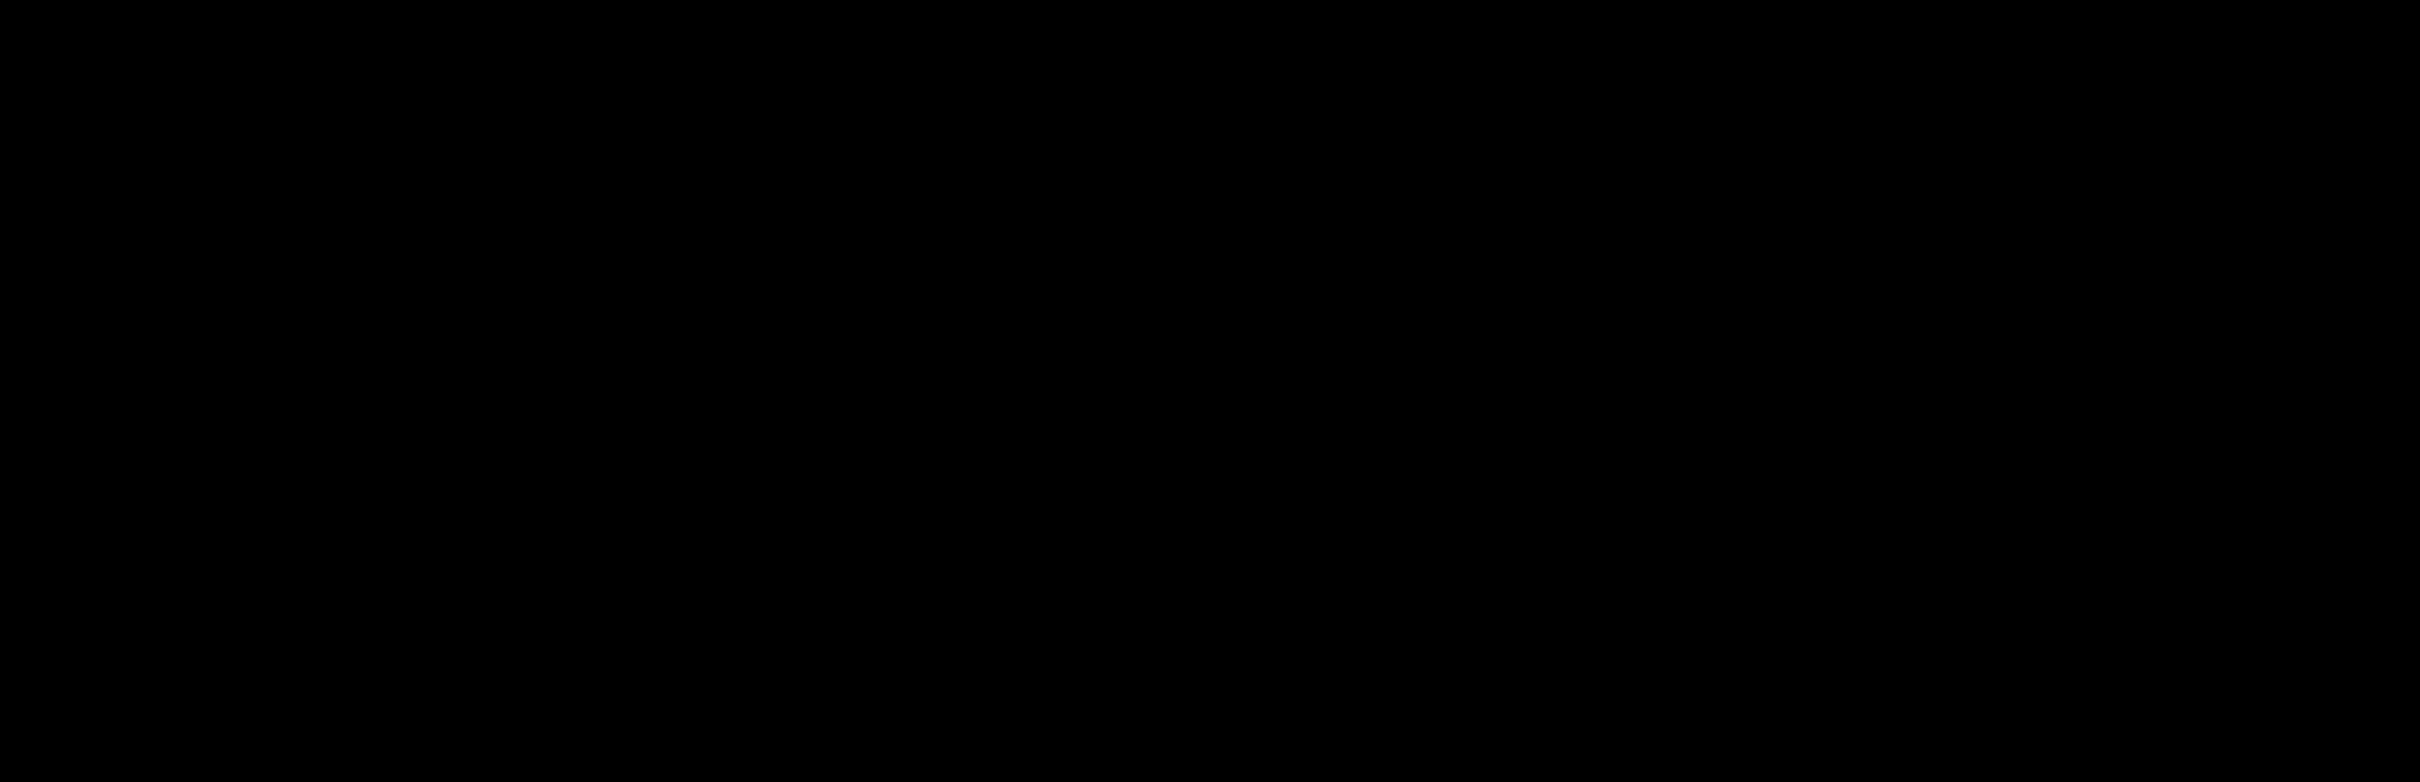 Biotinamidohexanoic acid N-hydroxysuccinimide ester